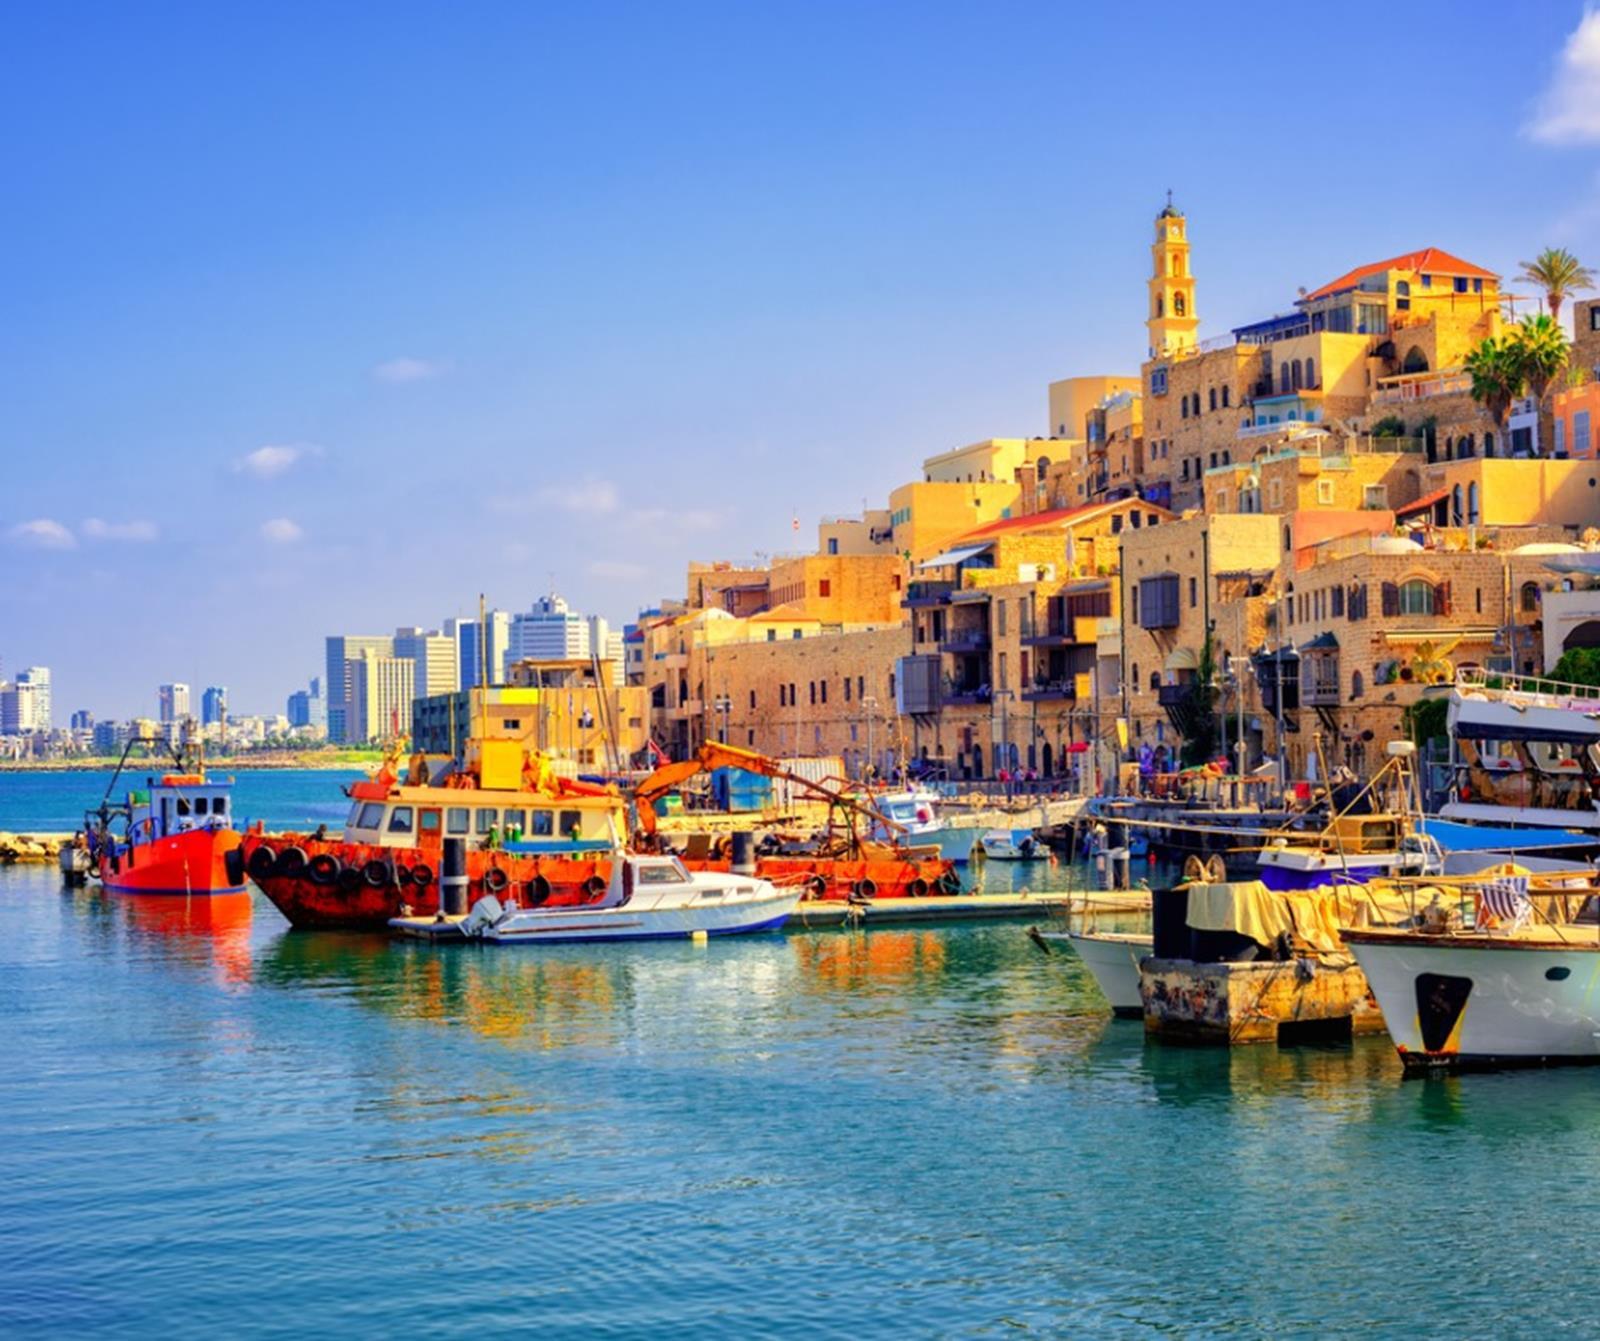 Jaffa Port Out of NYC Tel Aviv Jaffa Port